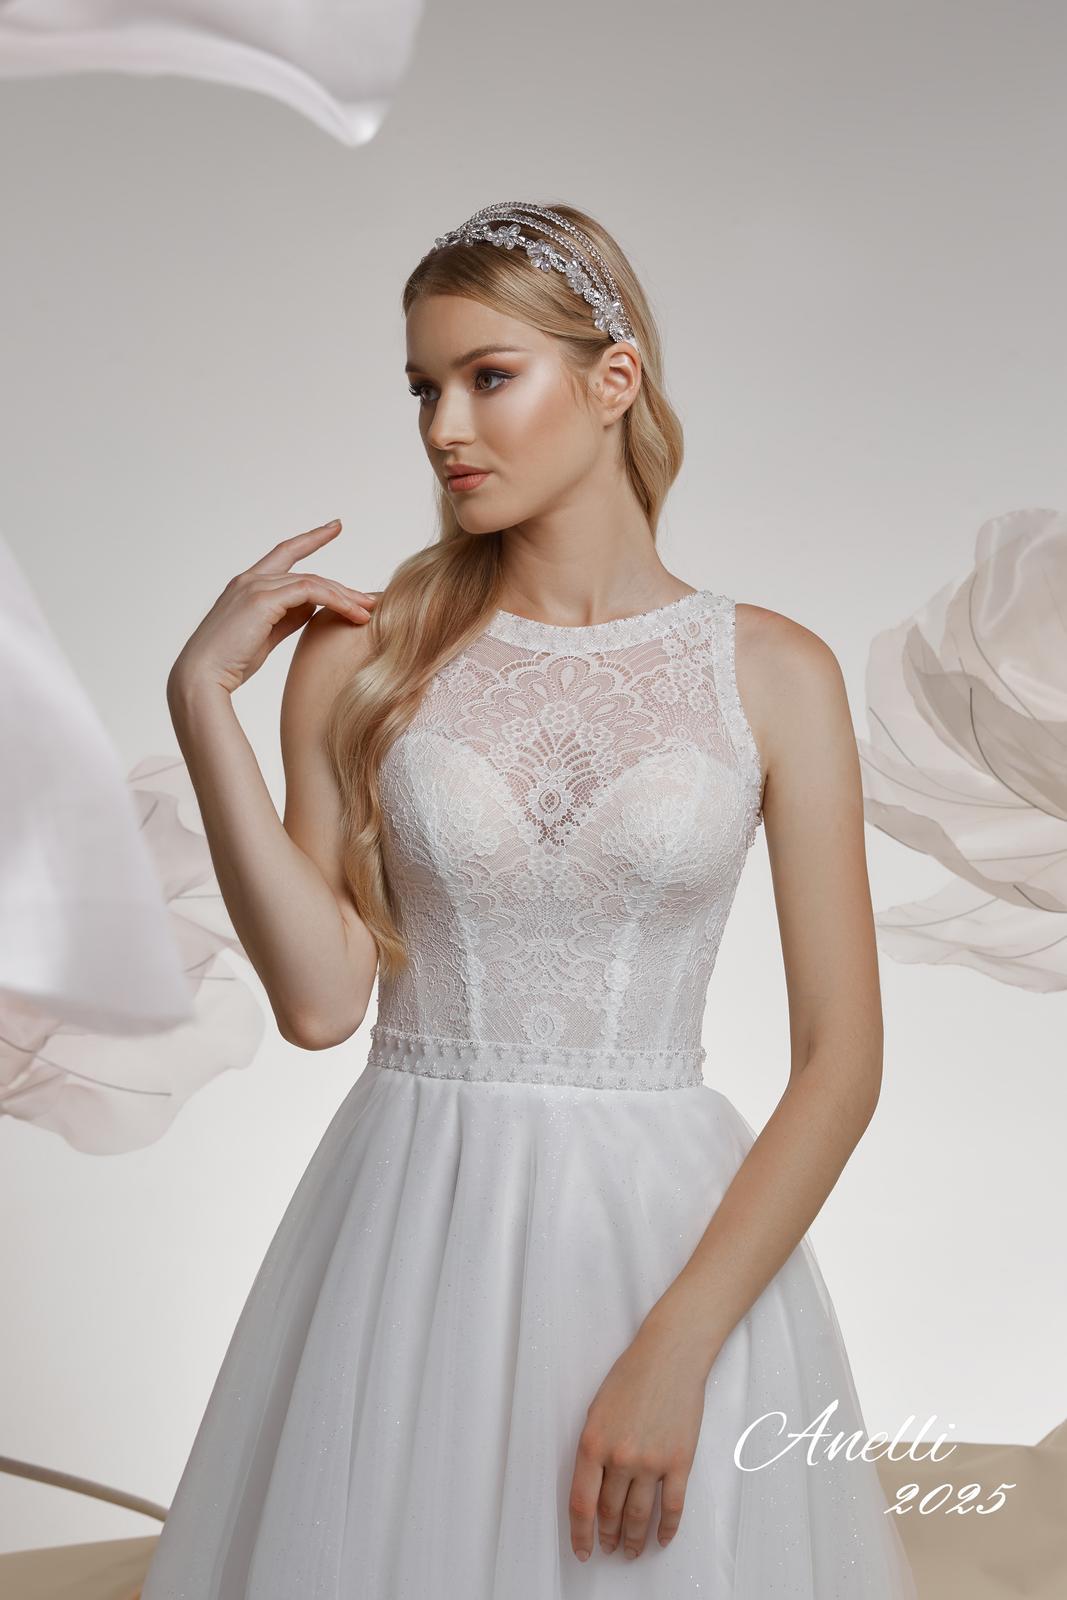 Svadobné šaty - Imagine 2025 - Obrázok č. 2